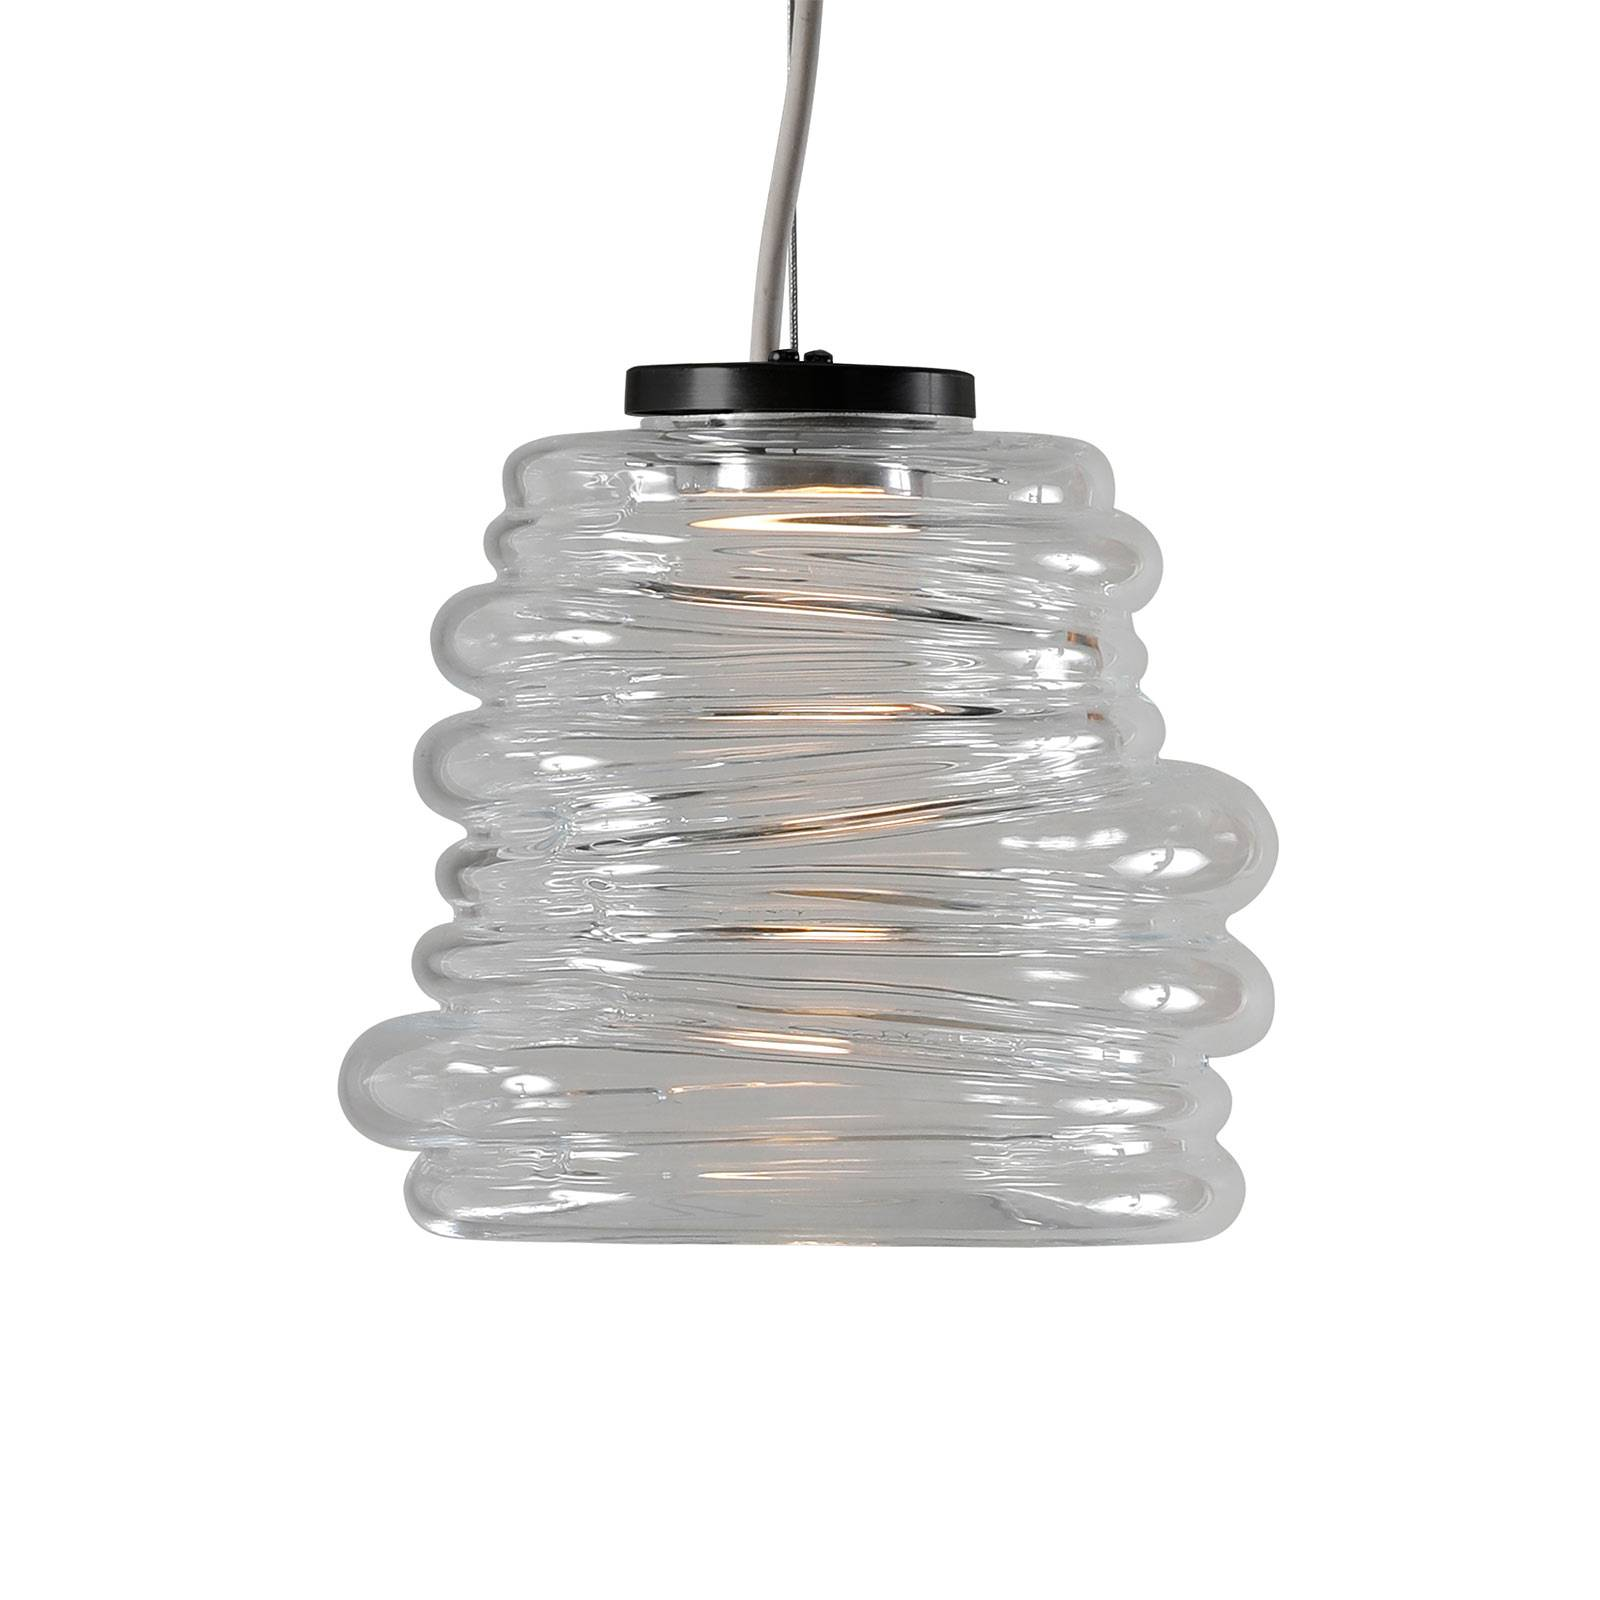 Karman Bibendum lampa wisząca LED, Ø 15 cm